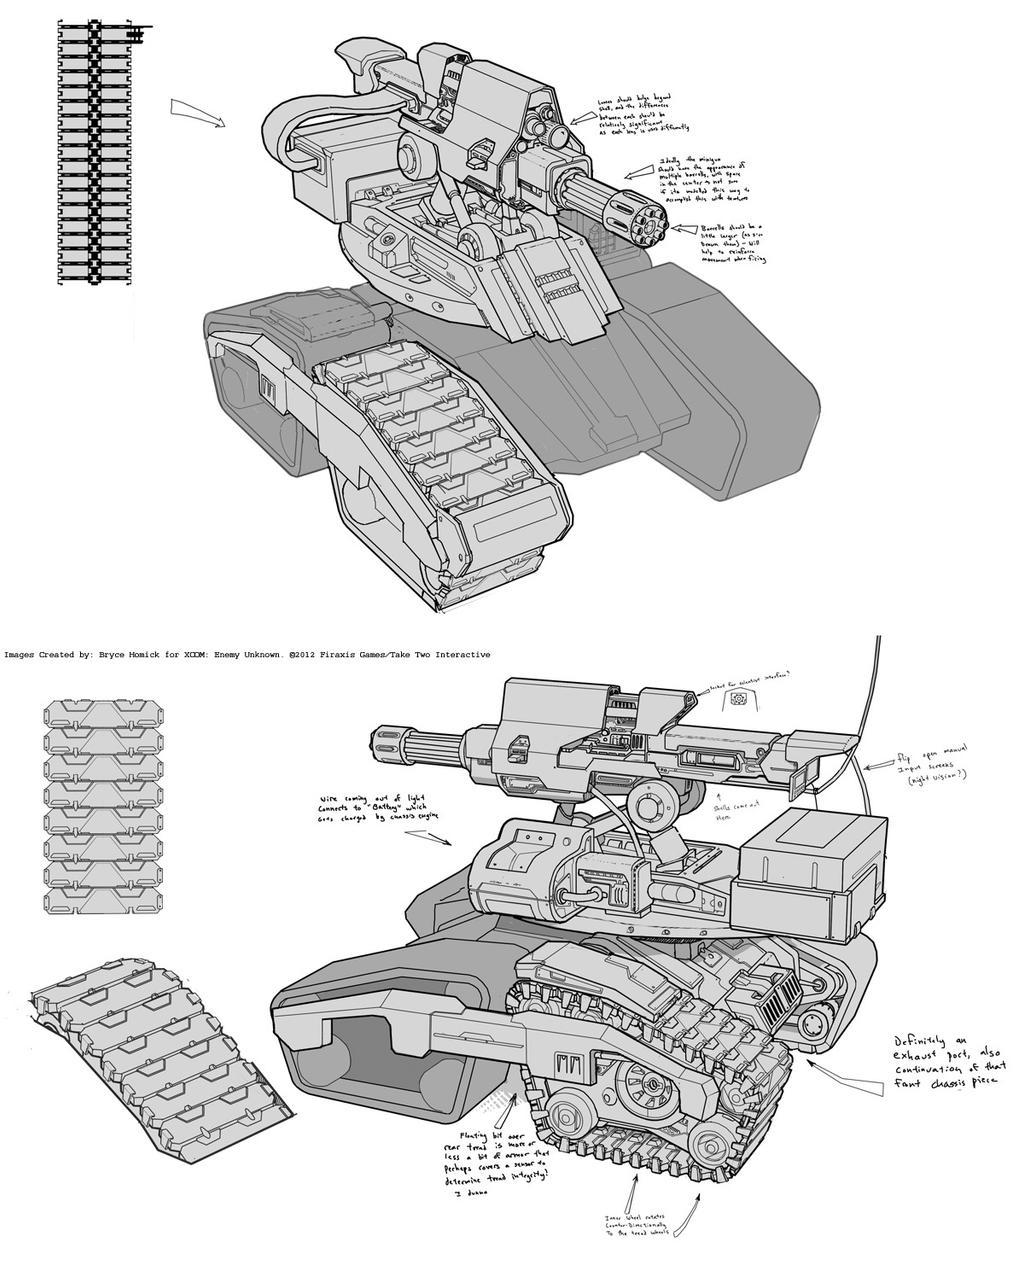 XCOM: SHIV Concept Art by zombat